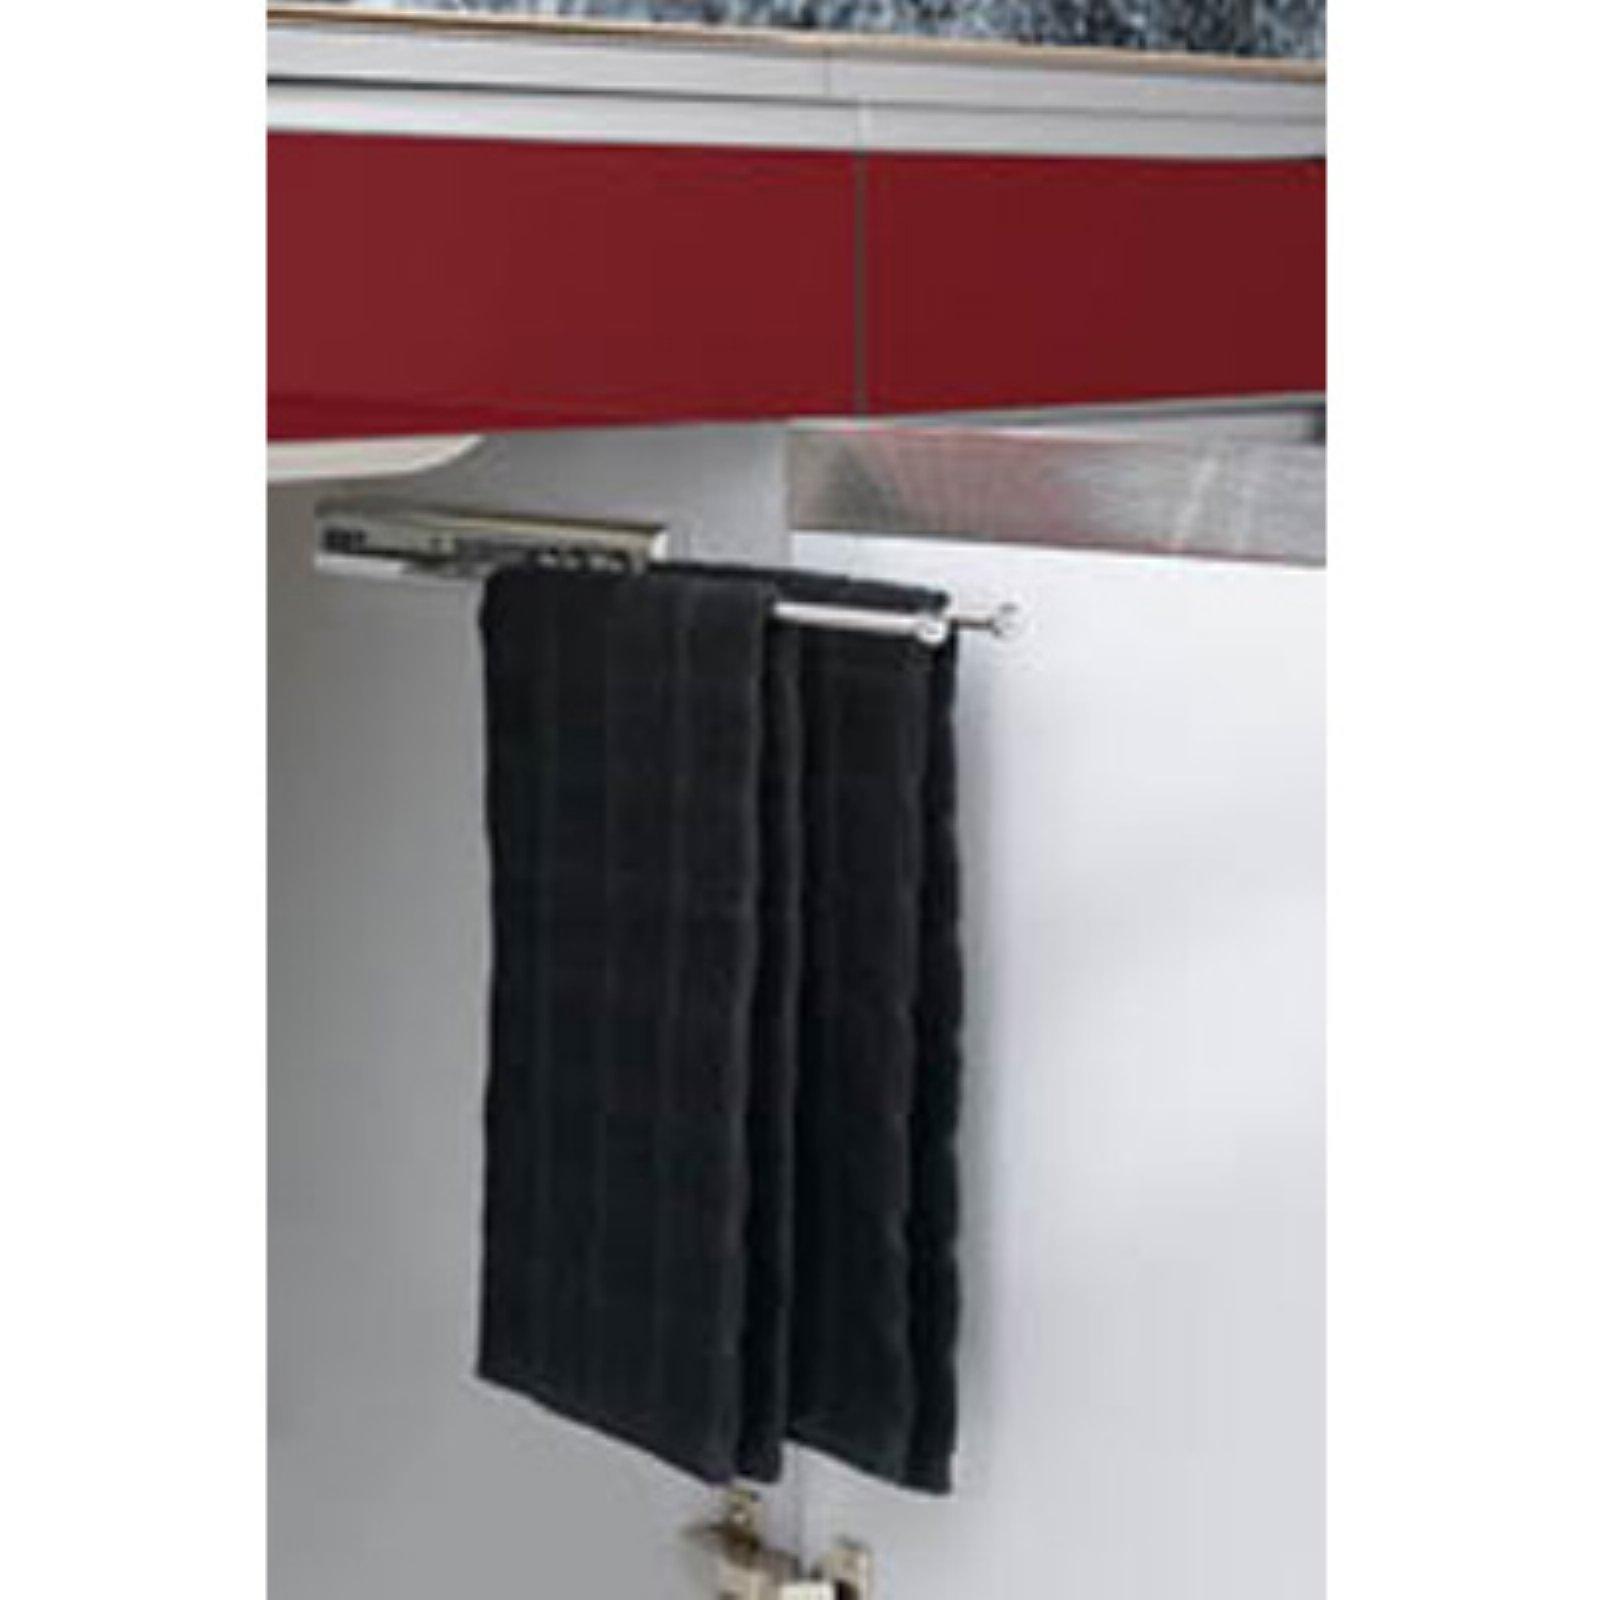 Rev-a-Shelf Undersink Pullout 3 Prong Towel Bar - Chrome